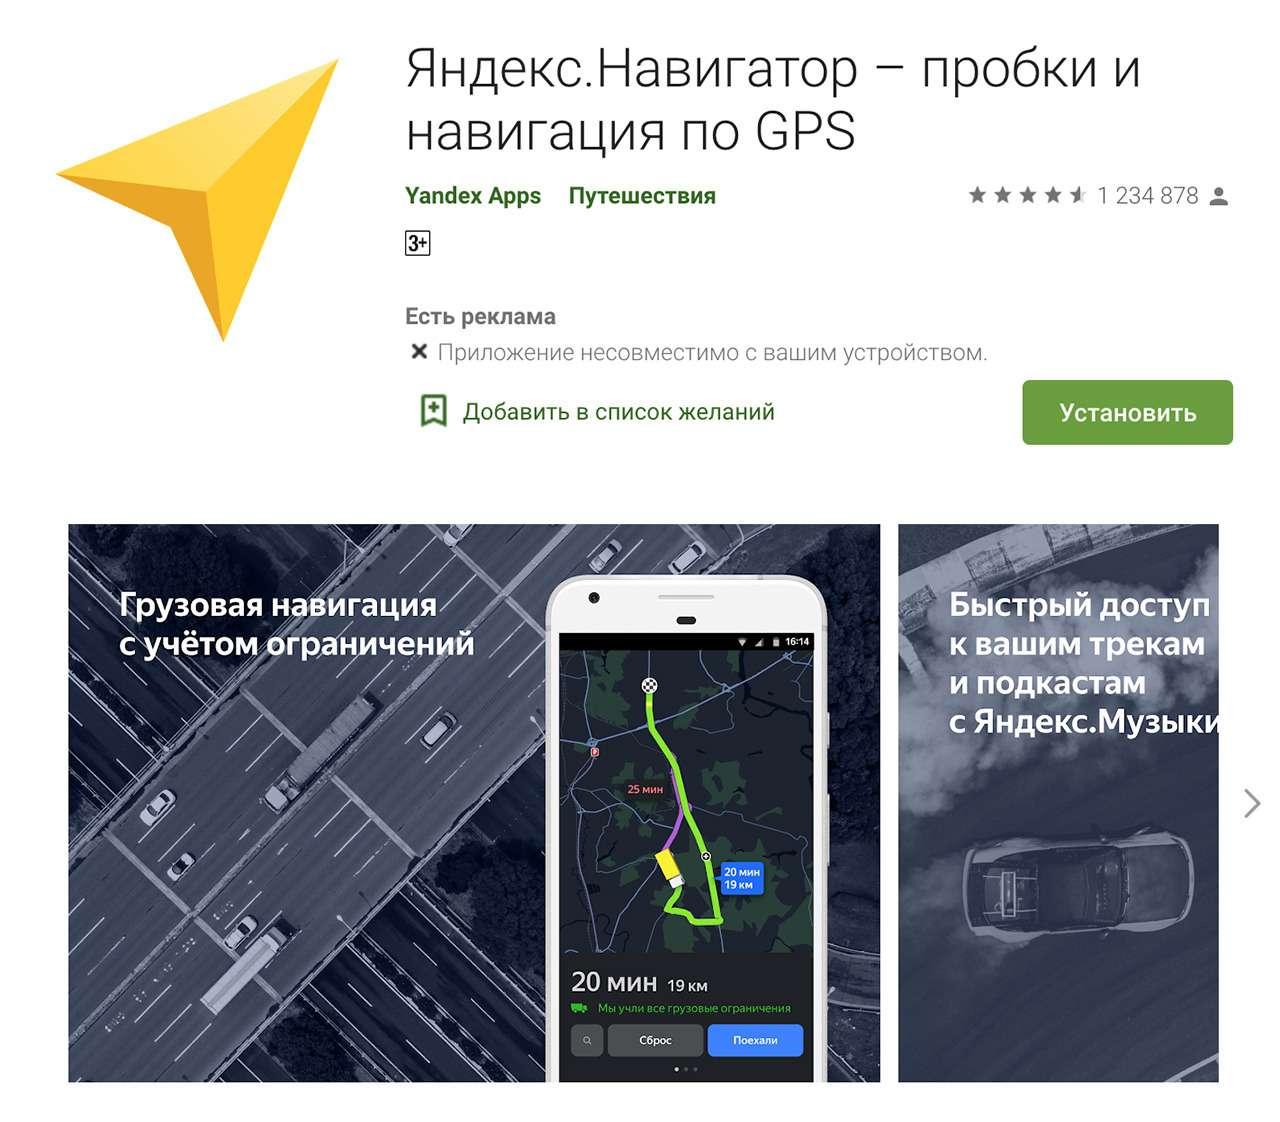 6 альтернатив Яндекс.Навигатору. Выберите свою— фото 1195240